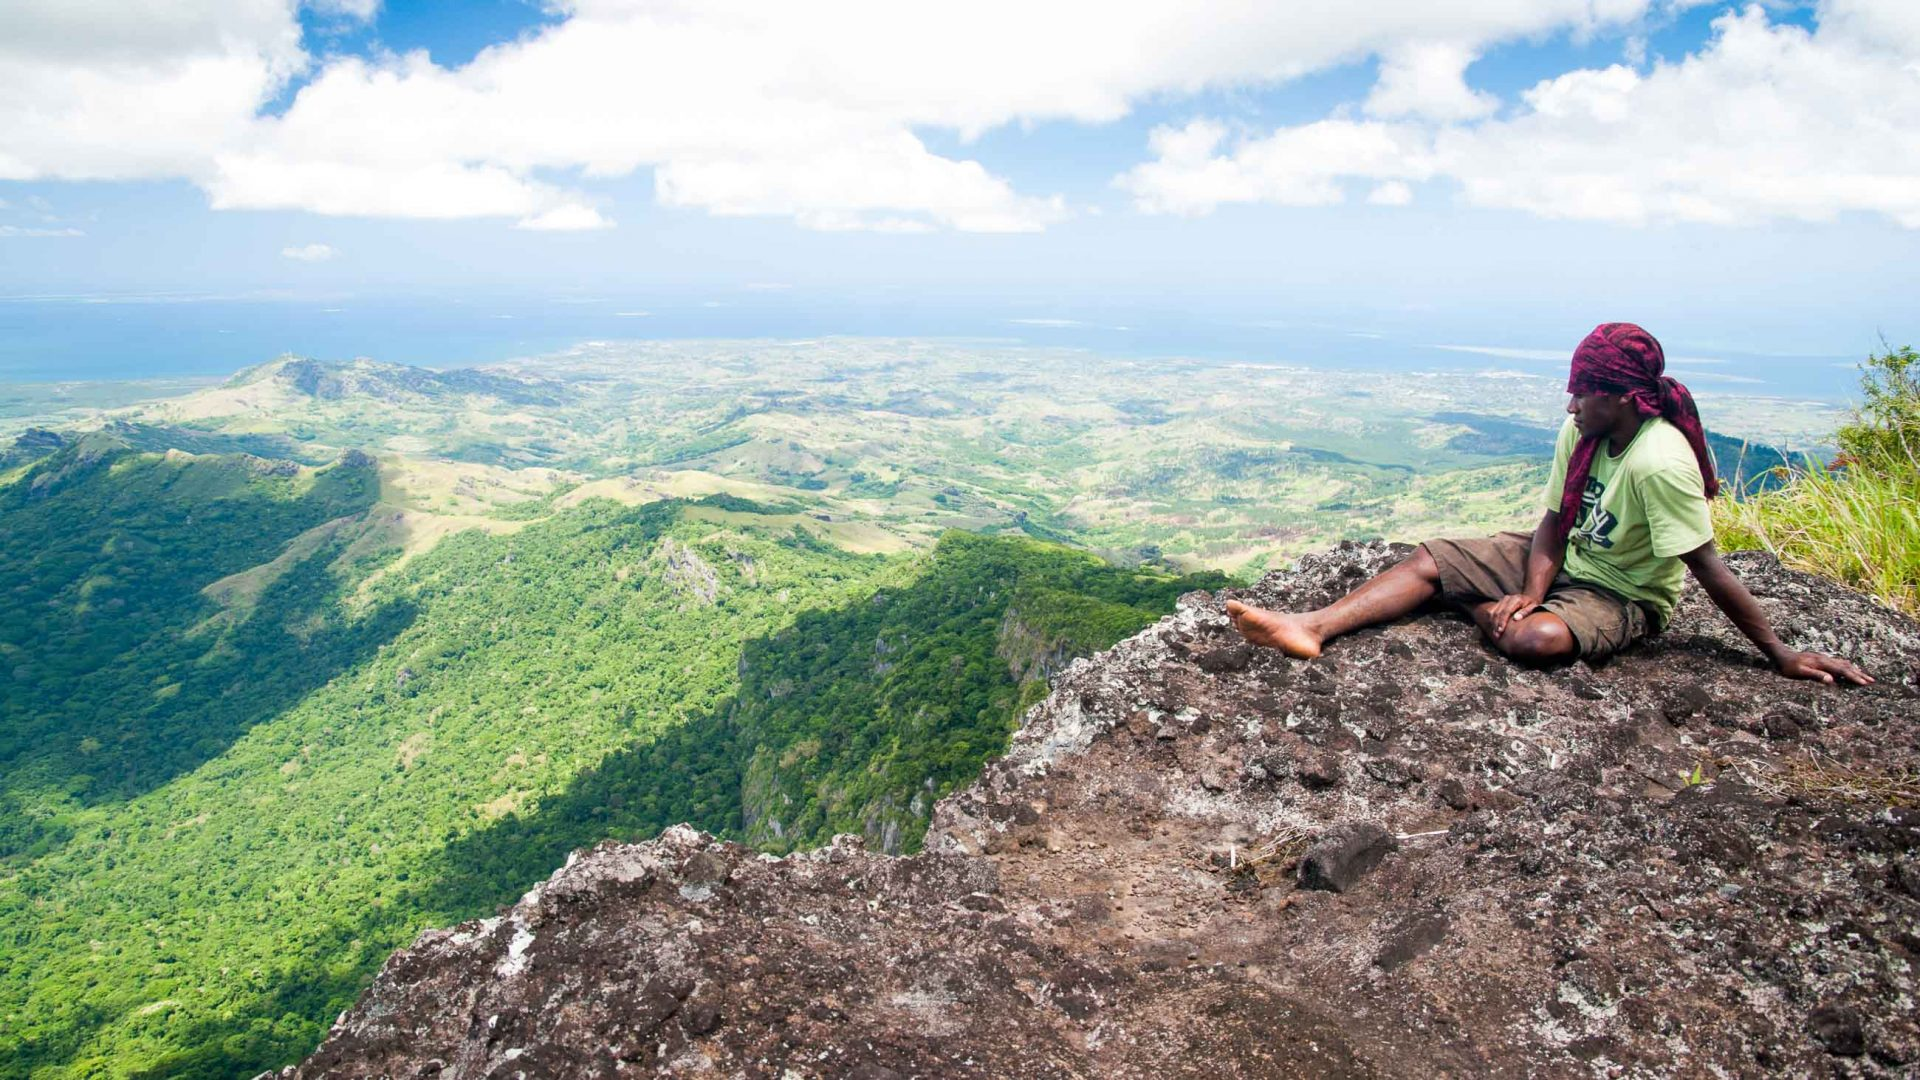 Paradise trekked: Fiji is a hiker's wonderland